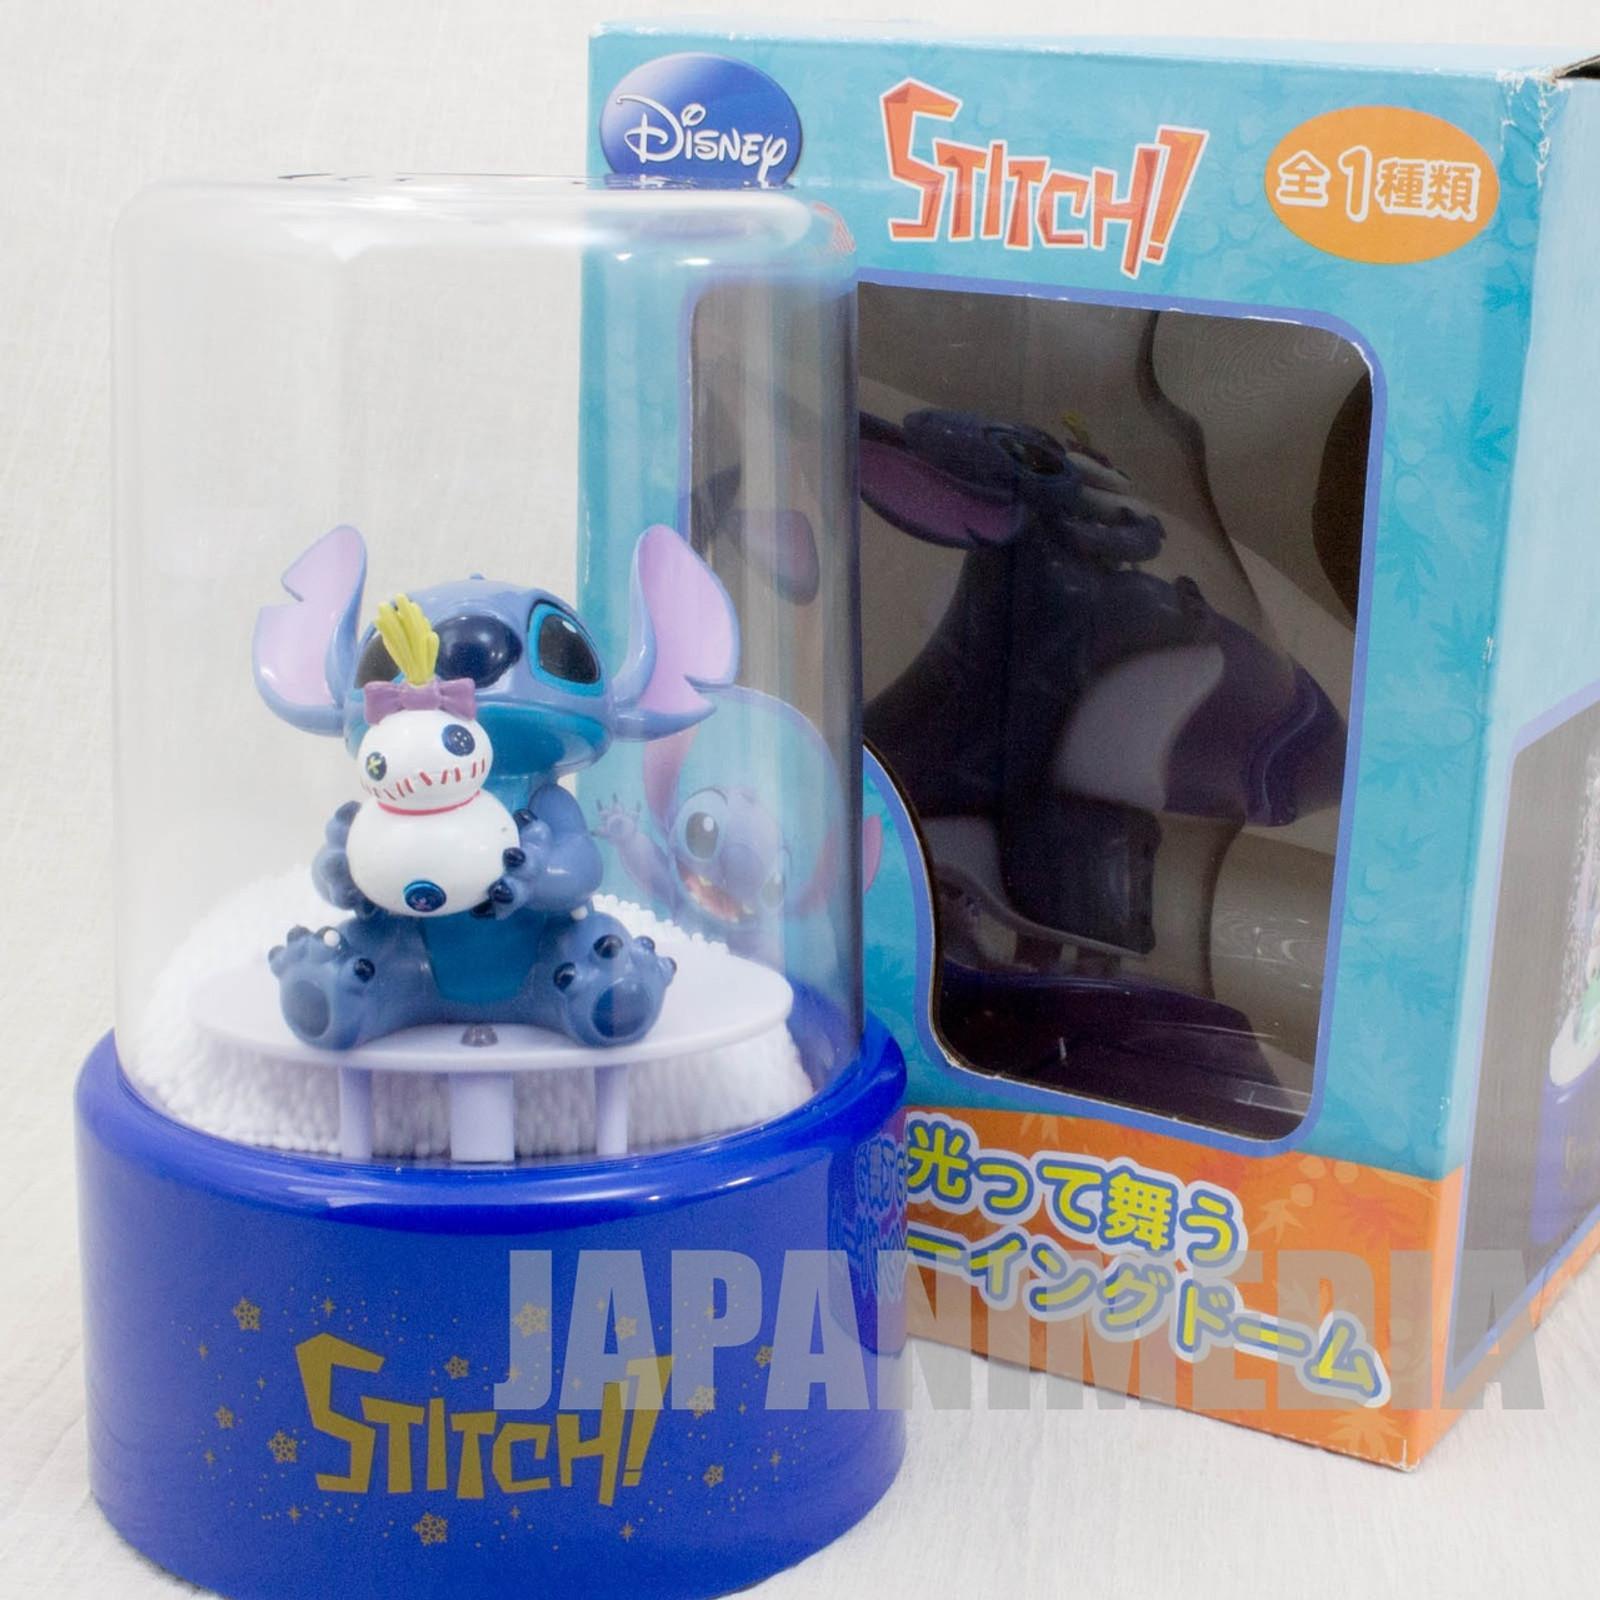 Disney Stitch Electric Snowing Dome Figure SEGA JAPAN ANIME